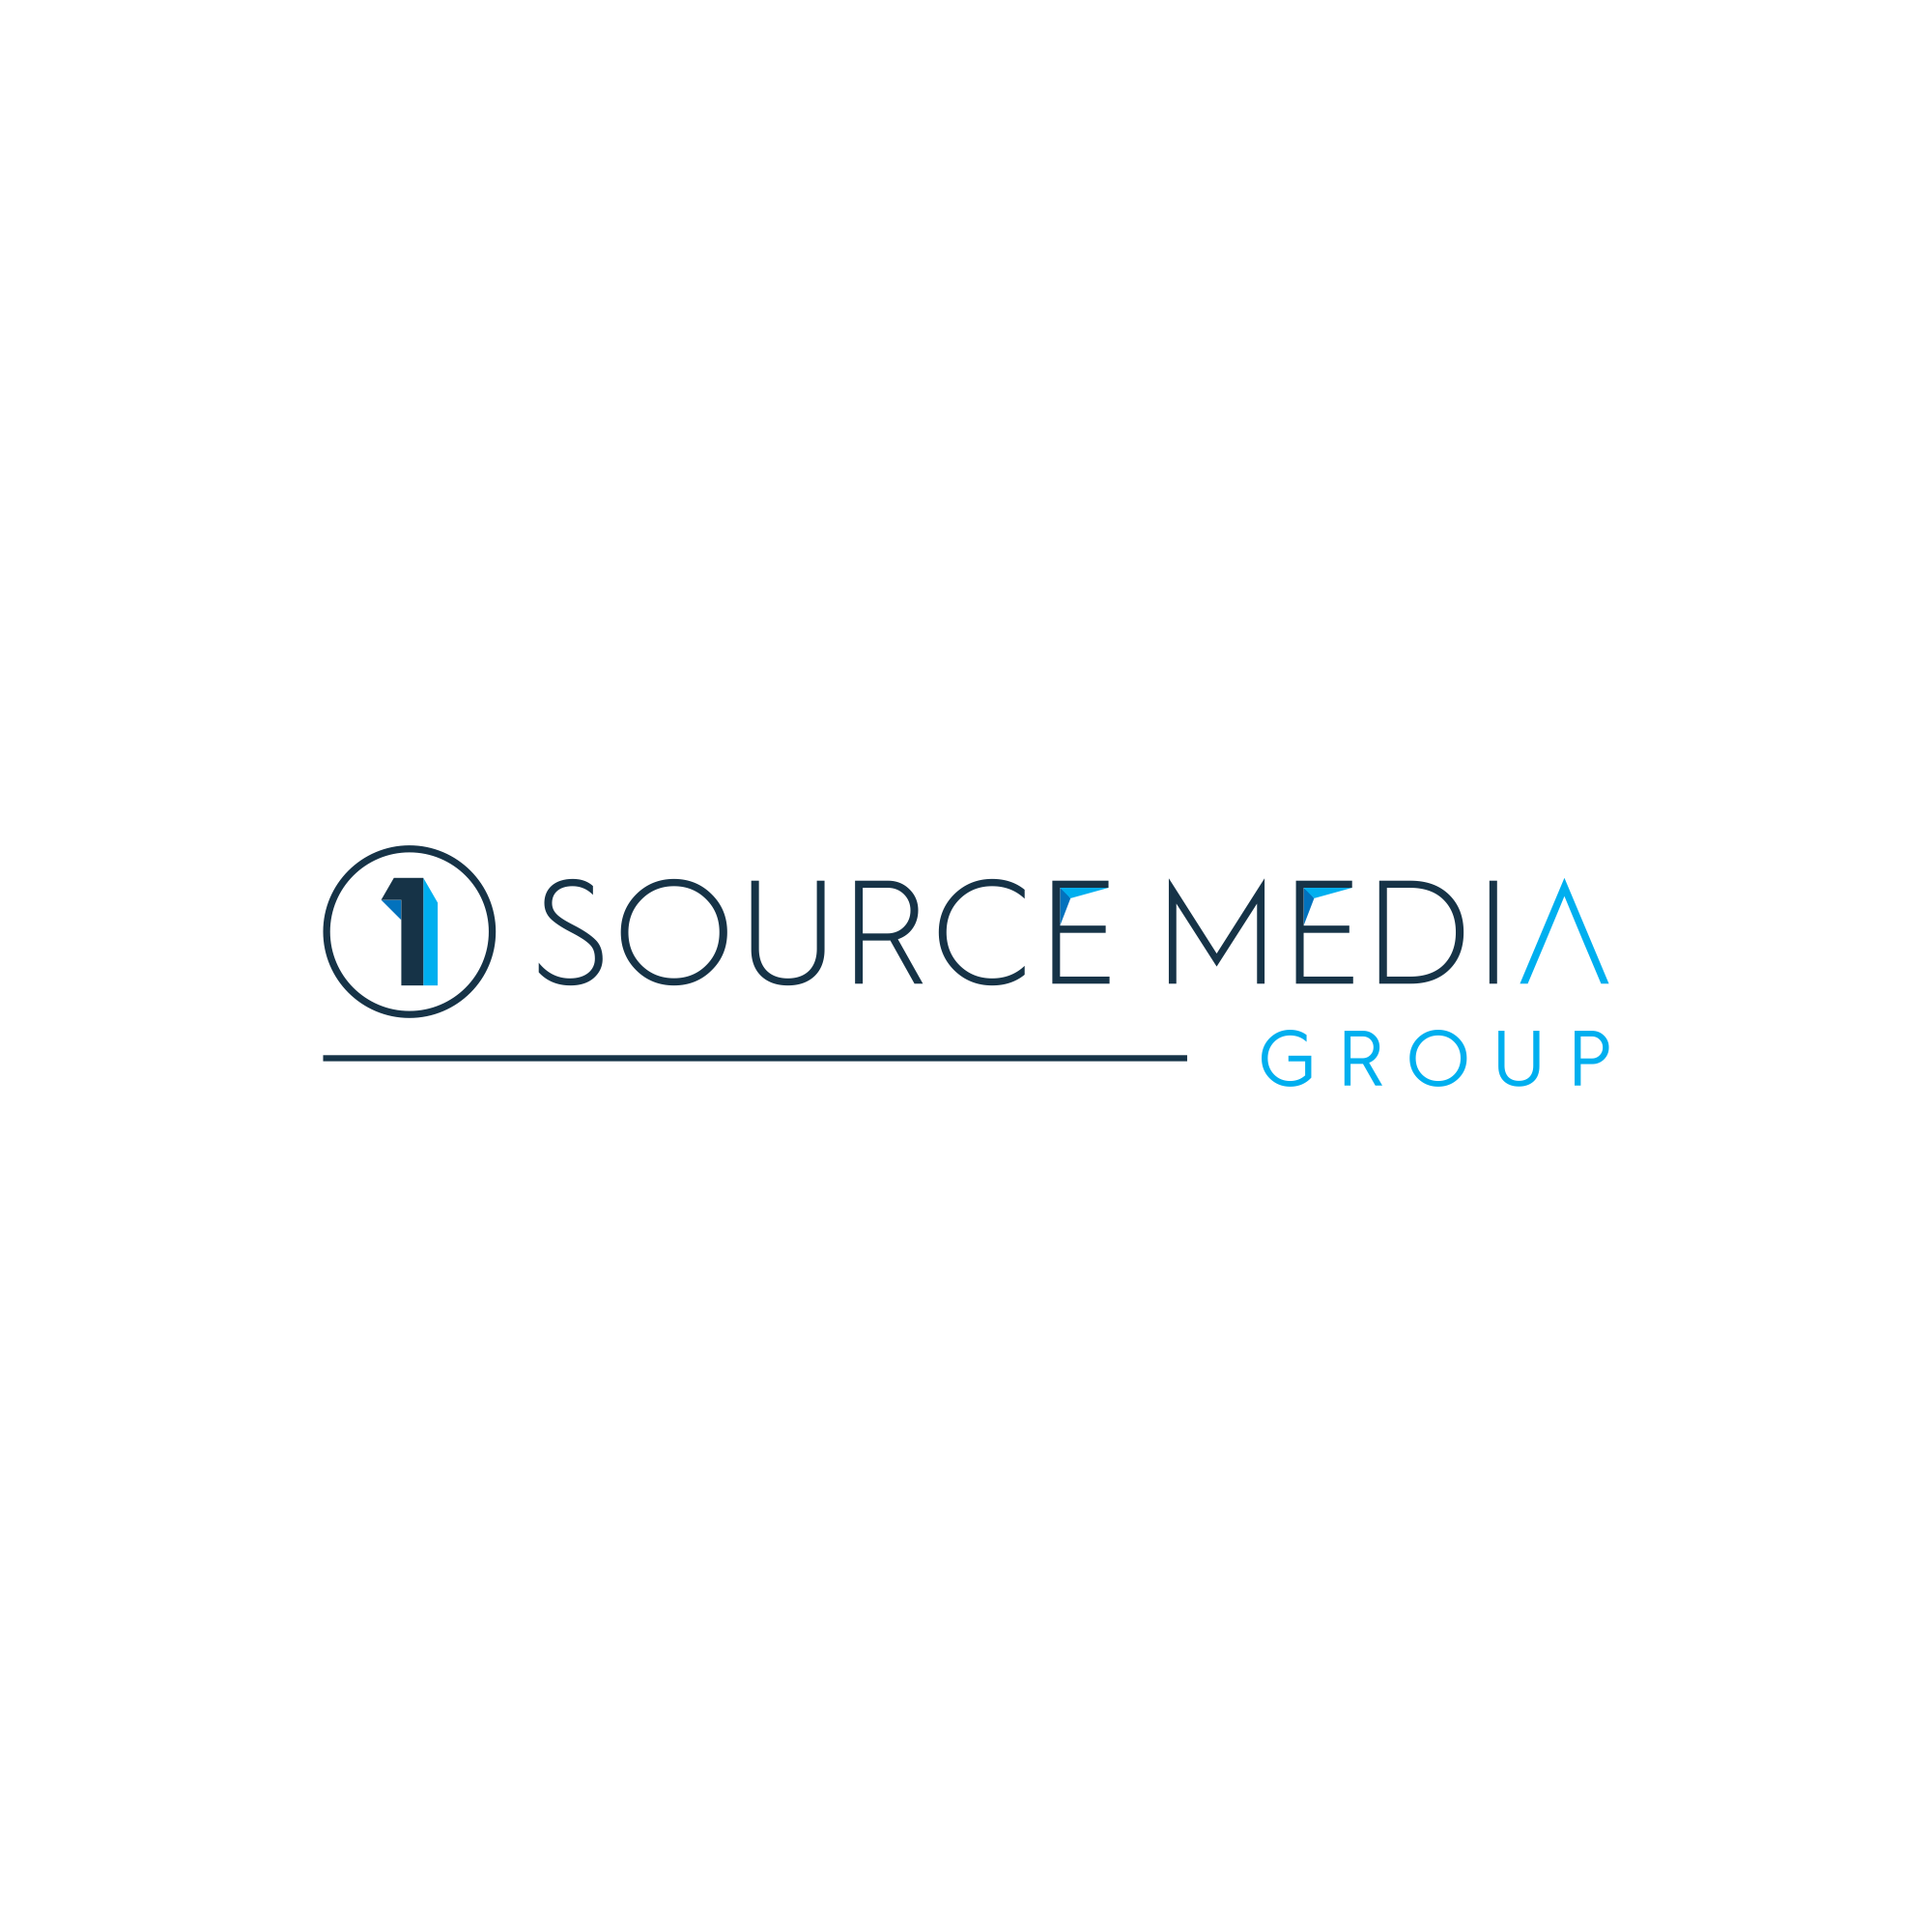 1 Source Media Group Logo